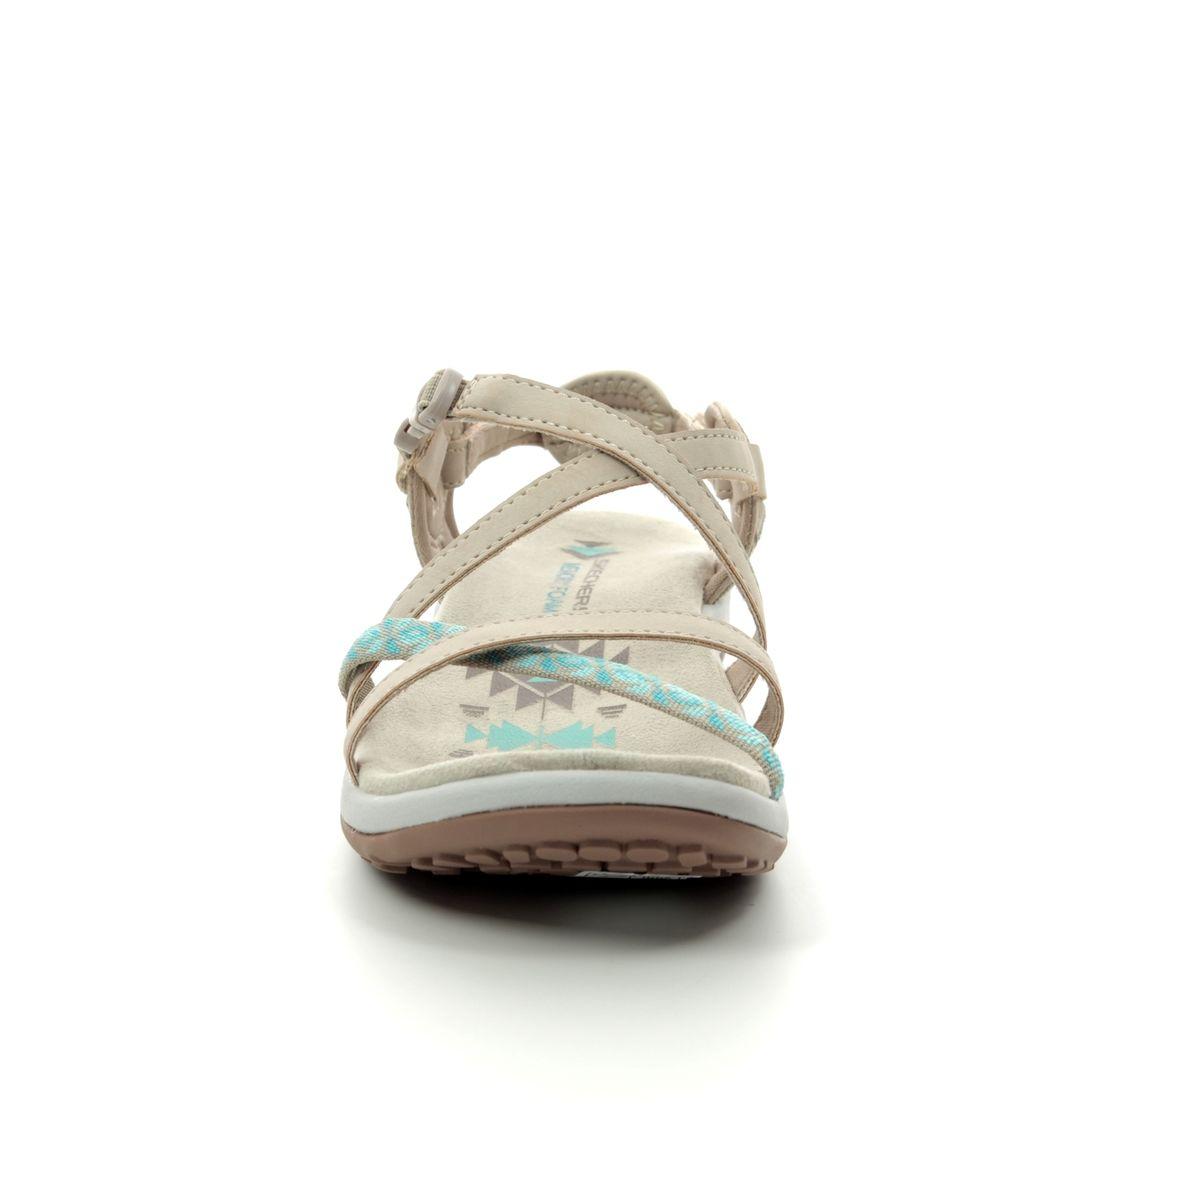 40955 Reggae Slim Vacay at Begg Shoes & Bags